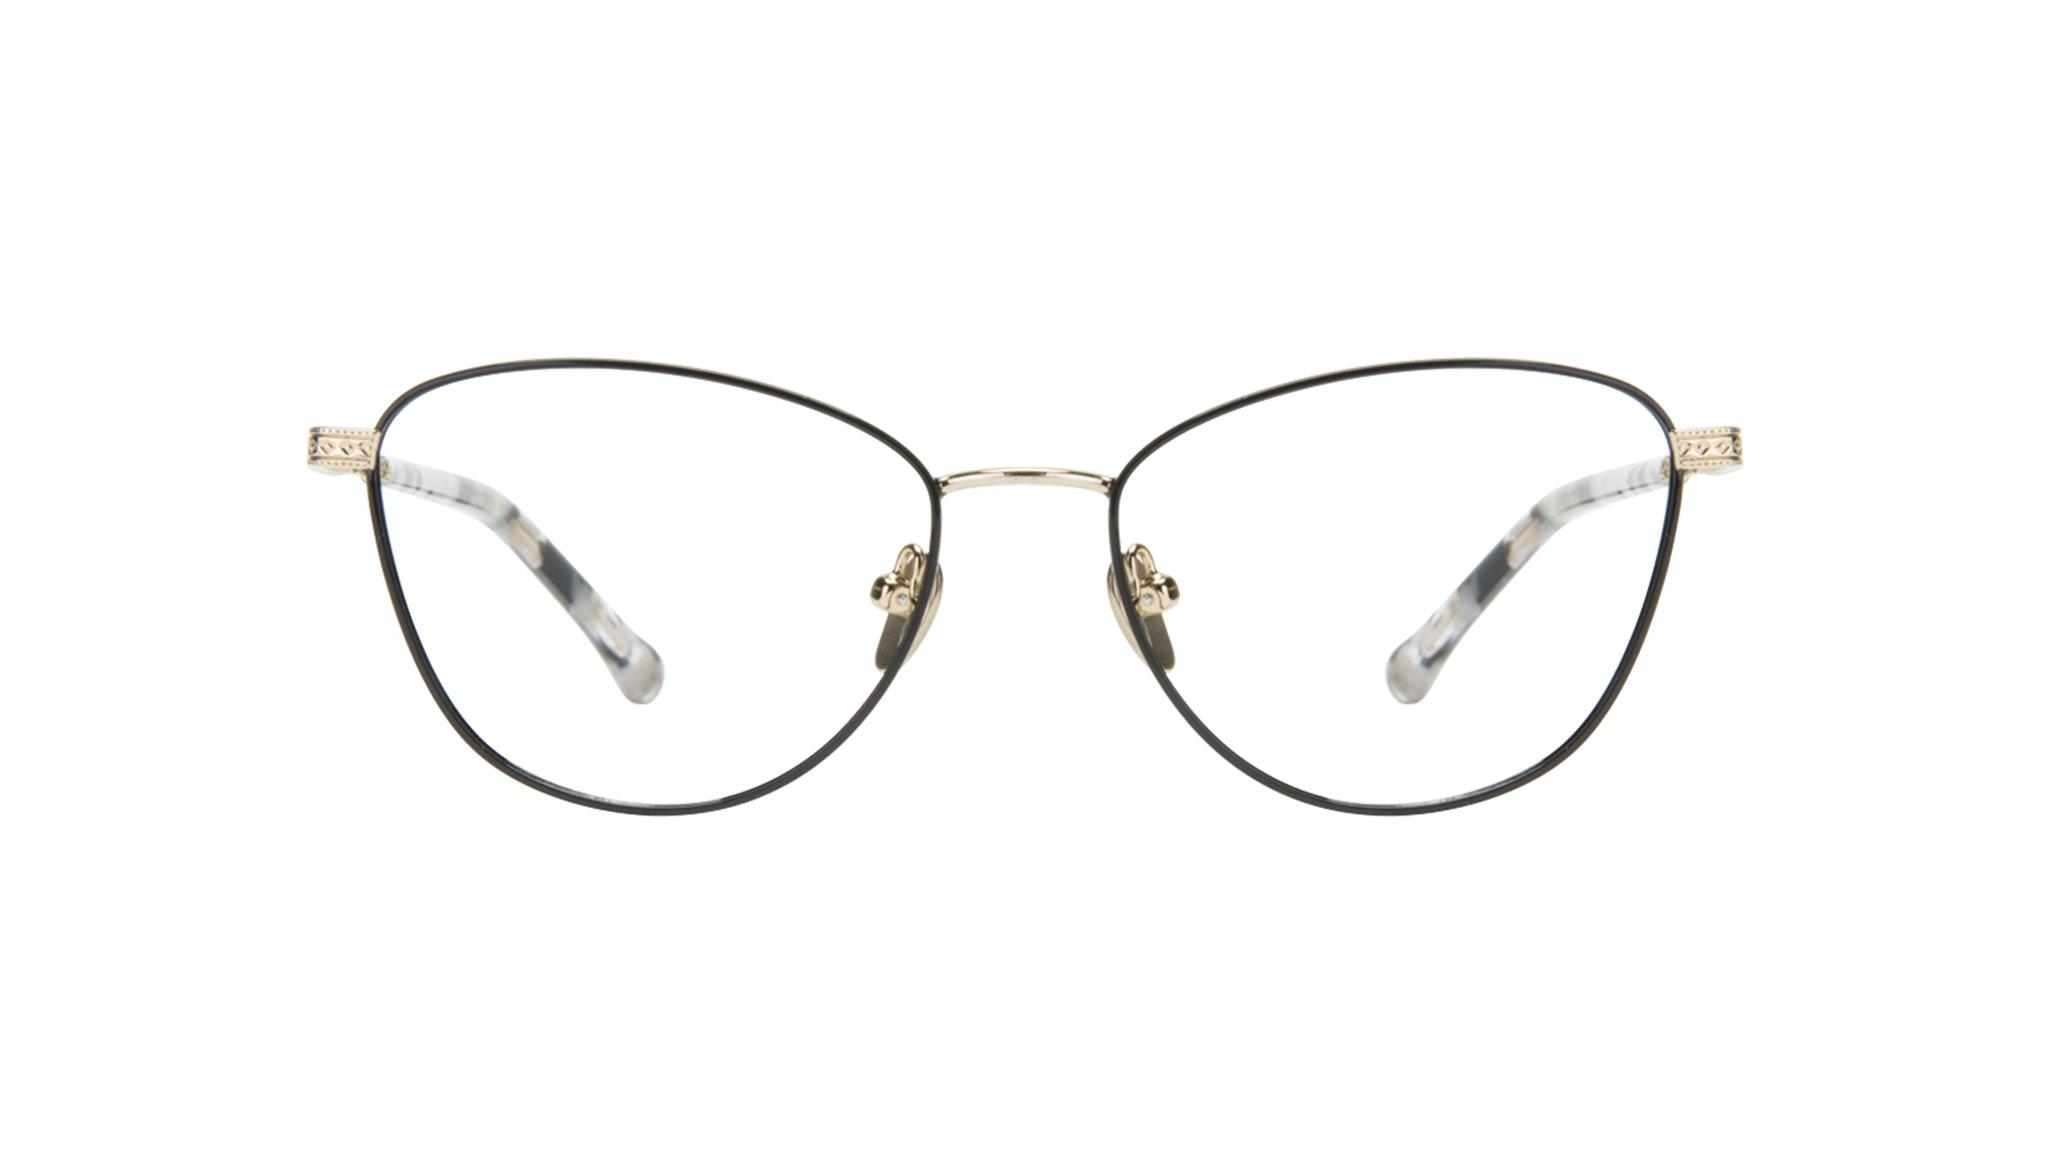 Affordable Fashion Glasses Cat Eye Eyeglasses Women Bow Onyx Marble Front